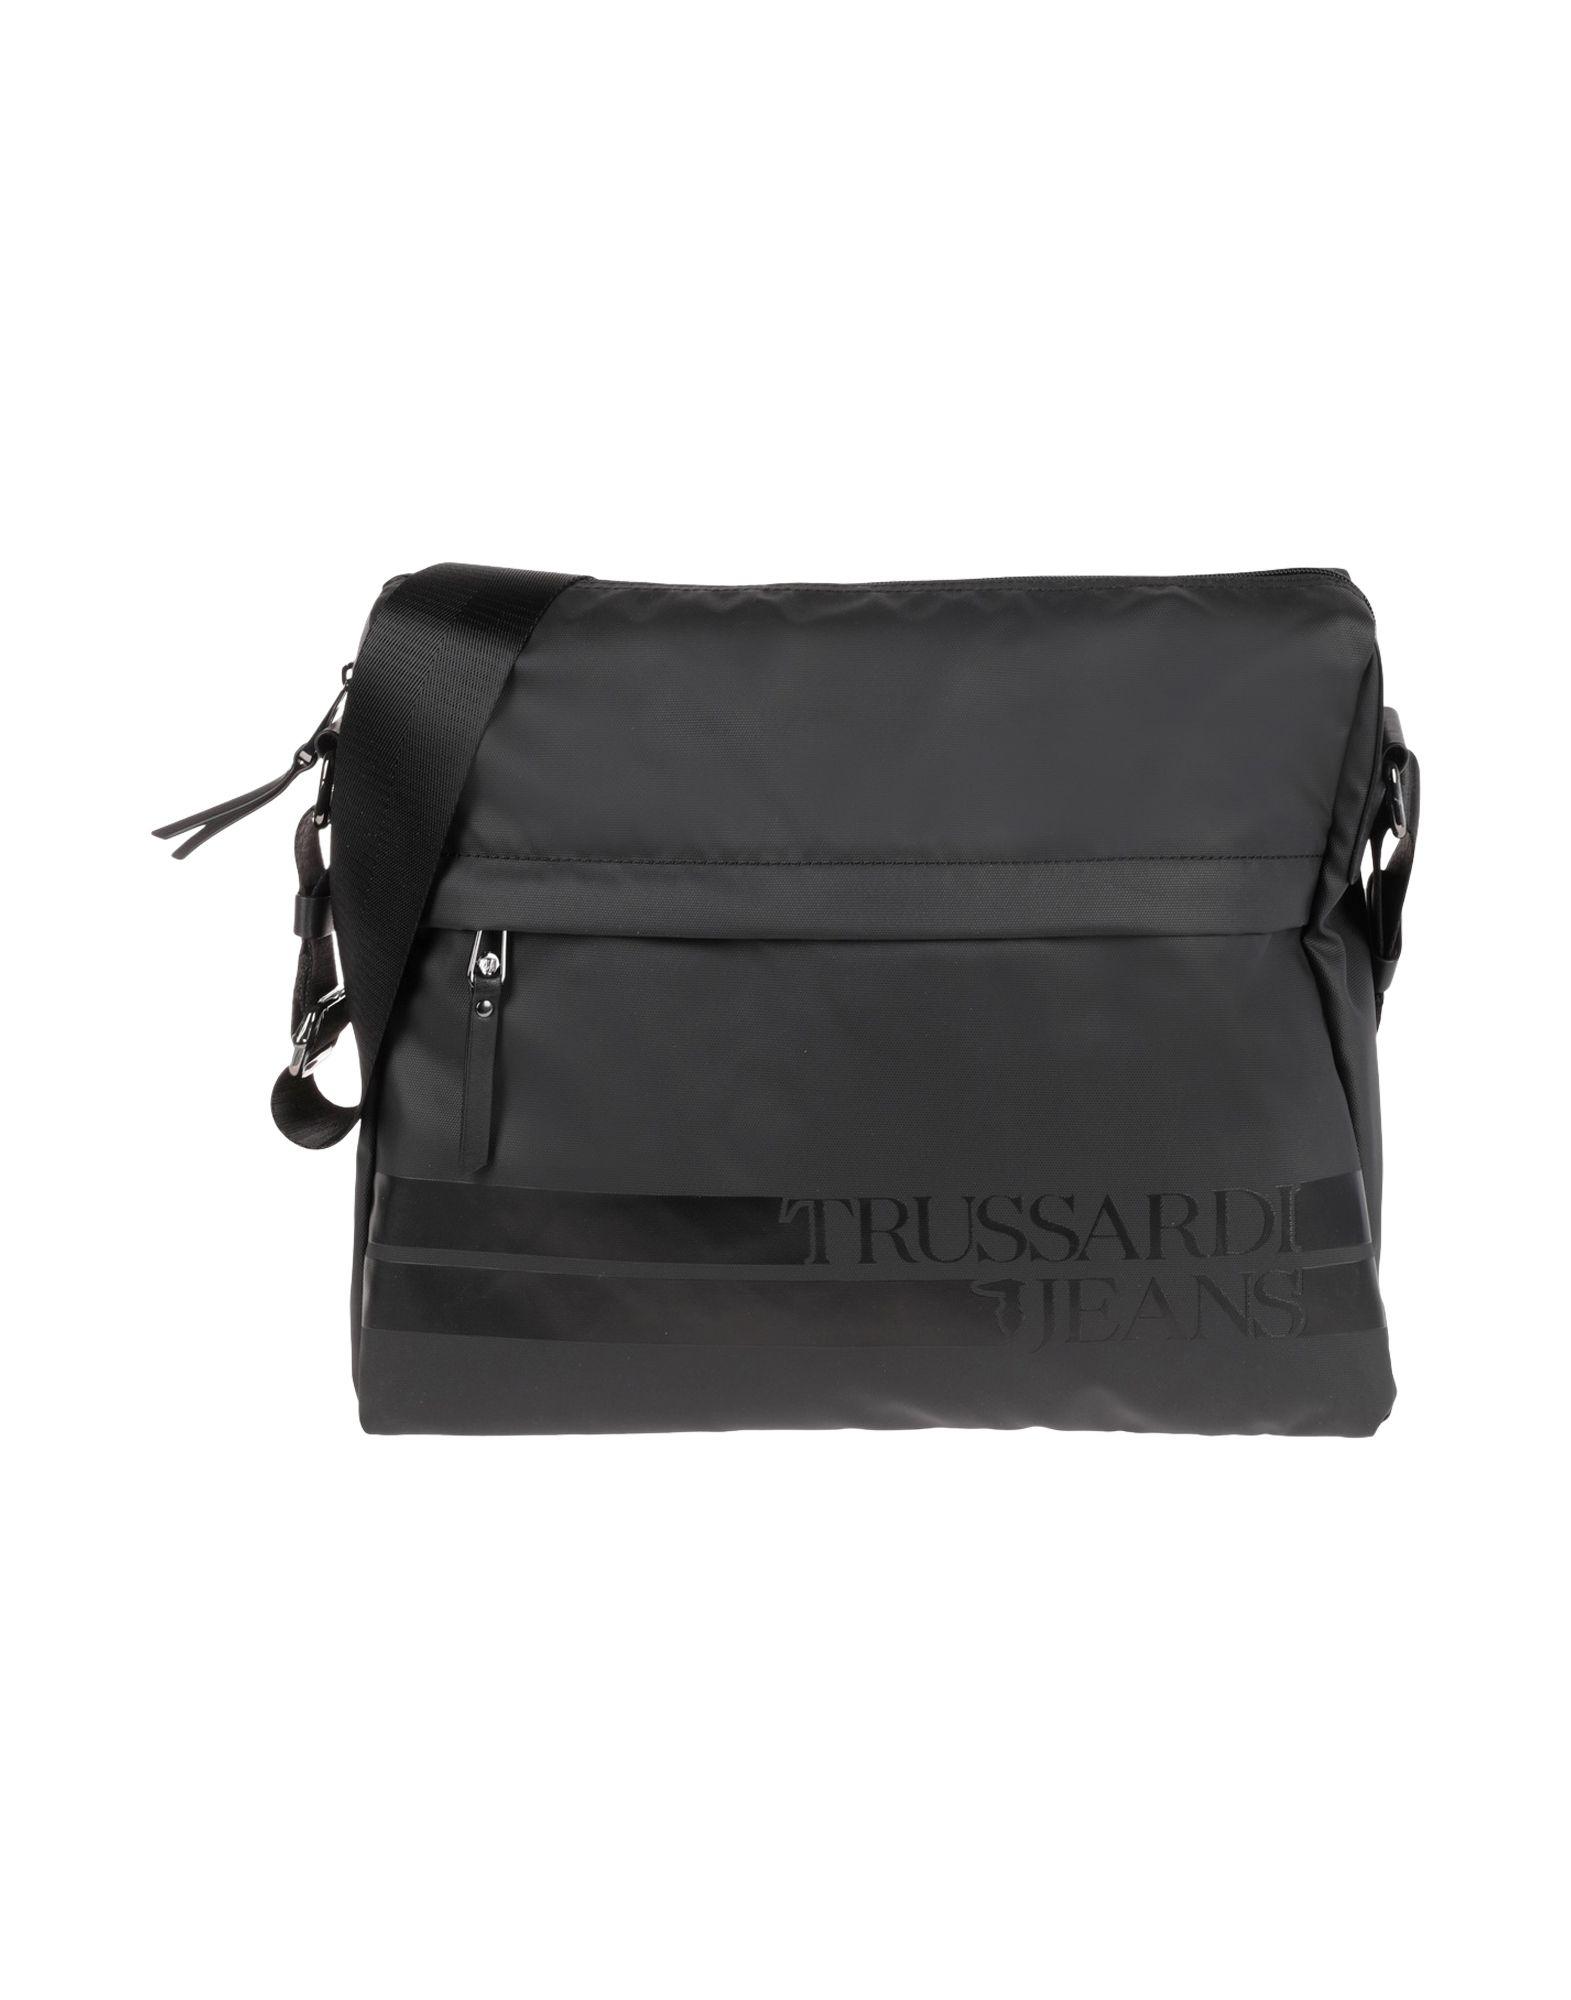 TRUSSARDI JEANS Деловые сумки